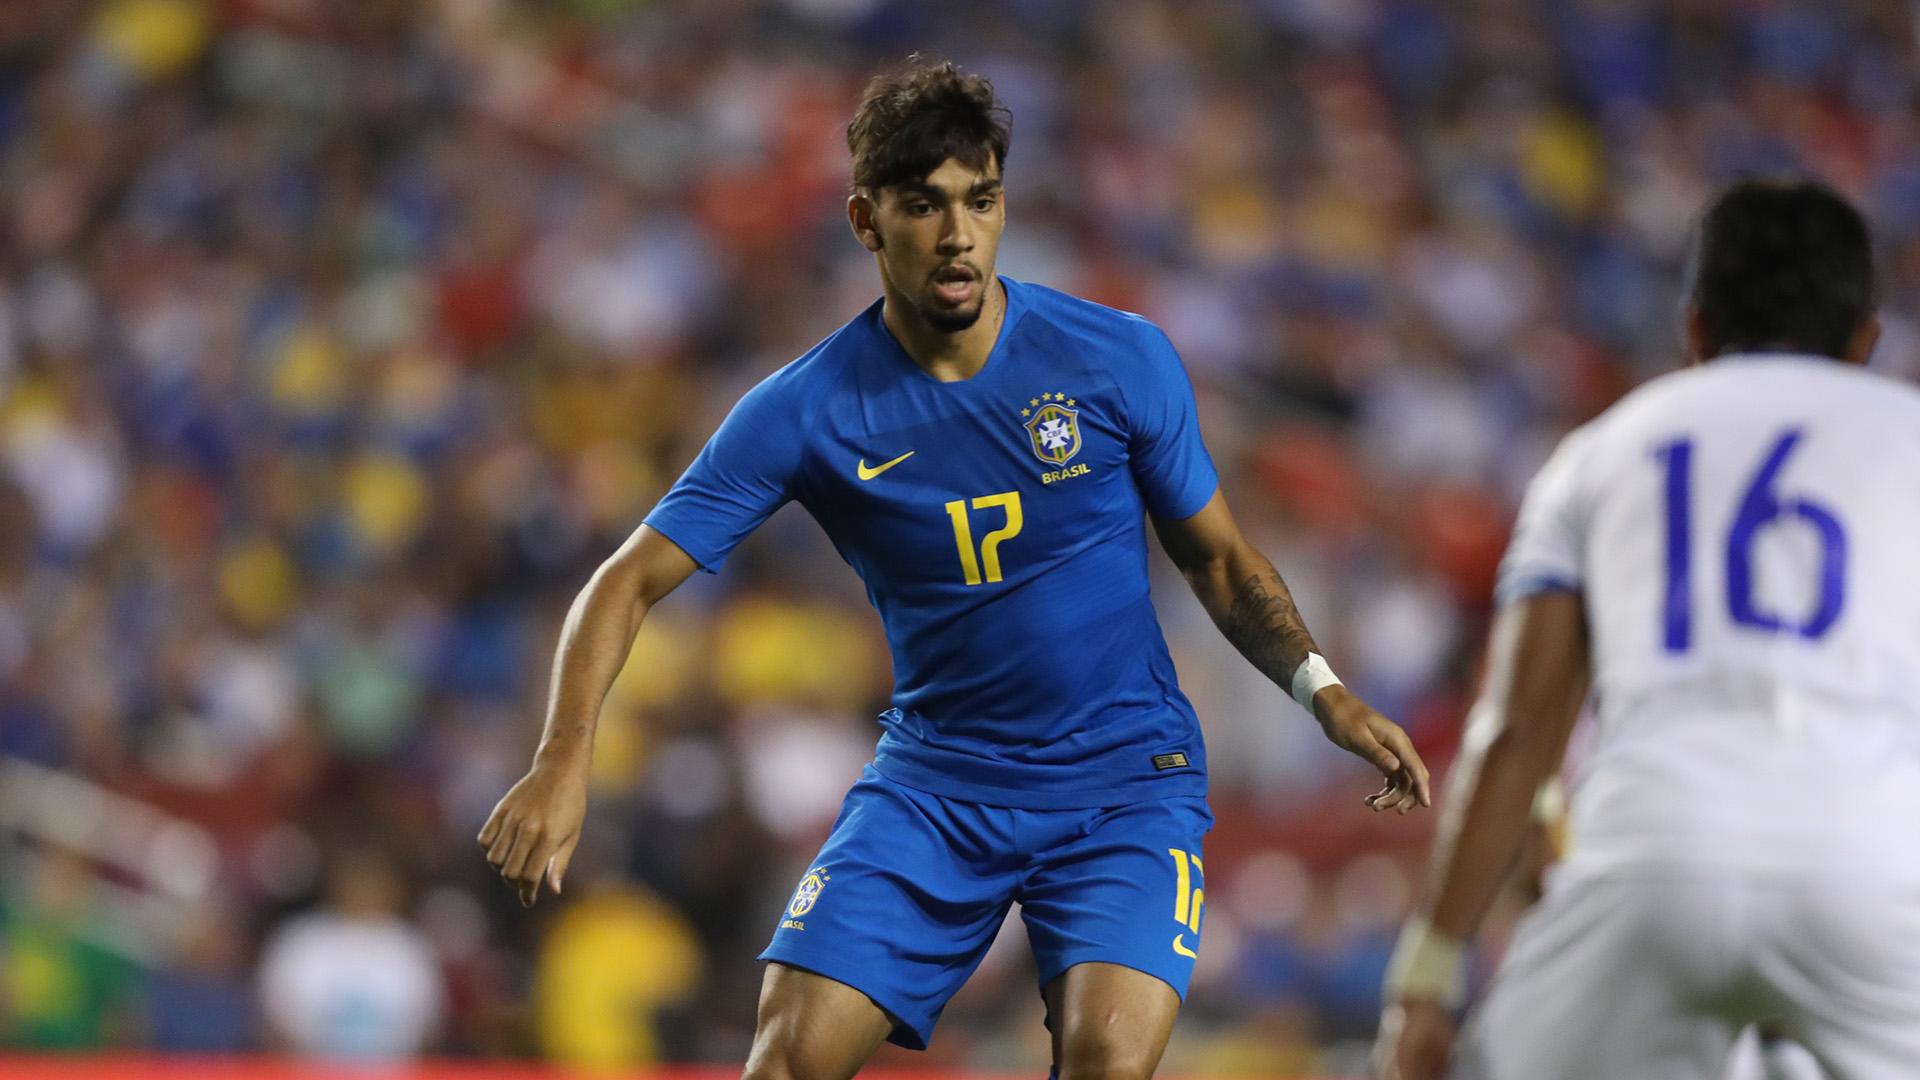 Lucas Paqueta Brazil El Salvador Friendly 11092018